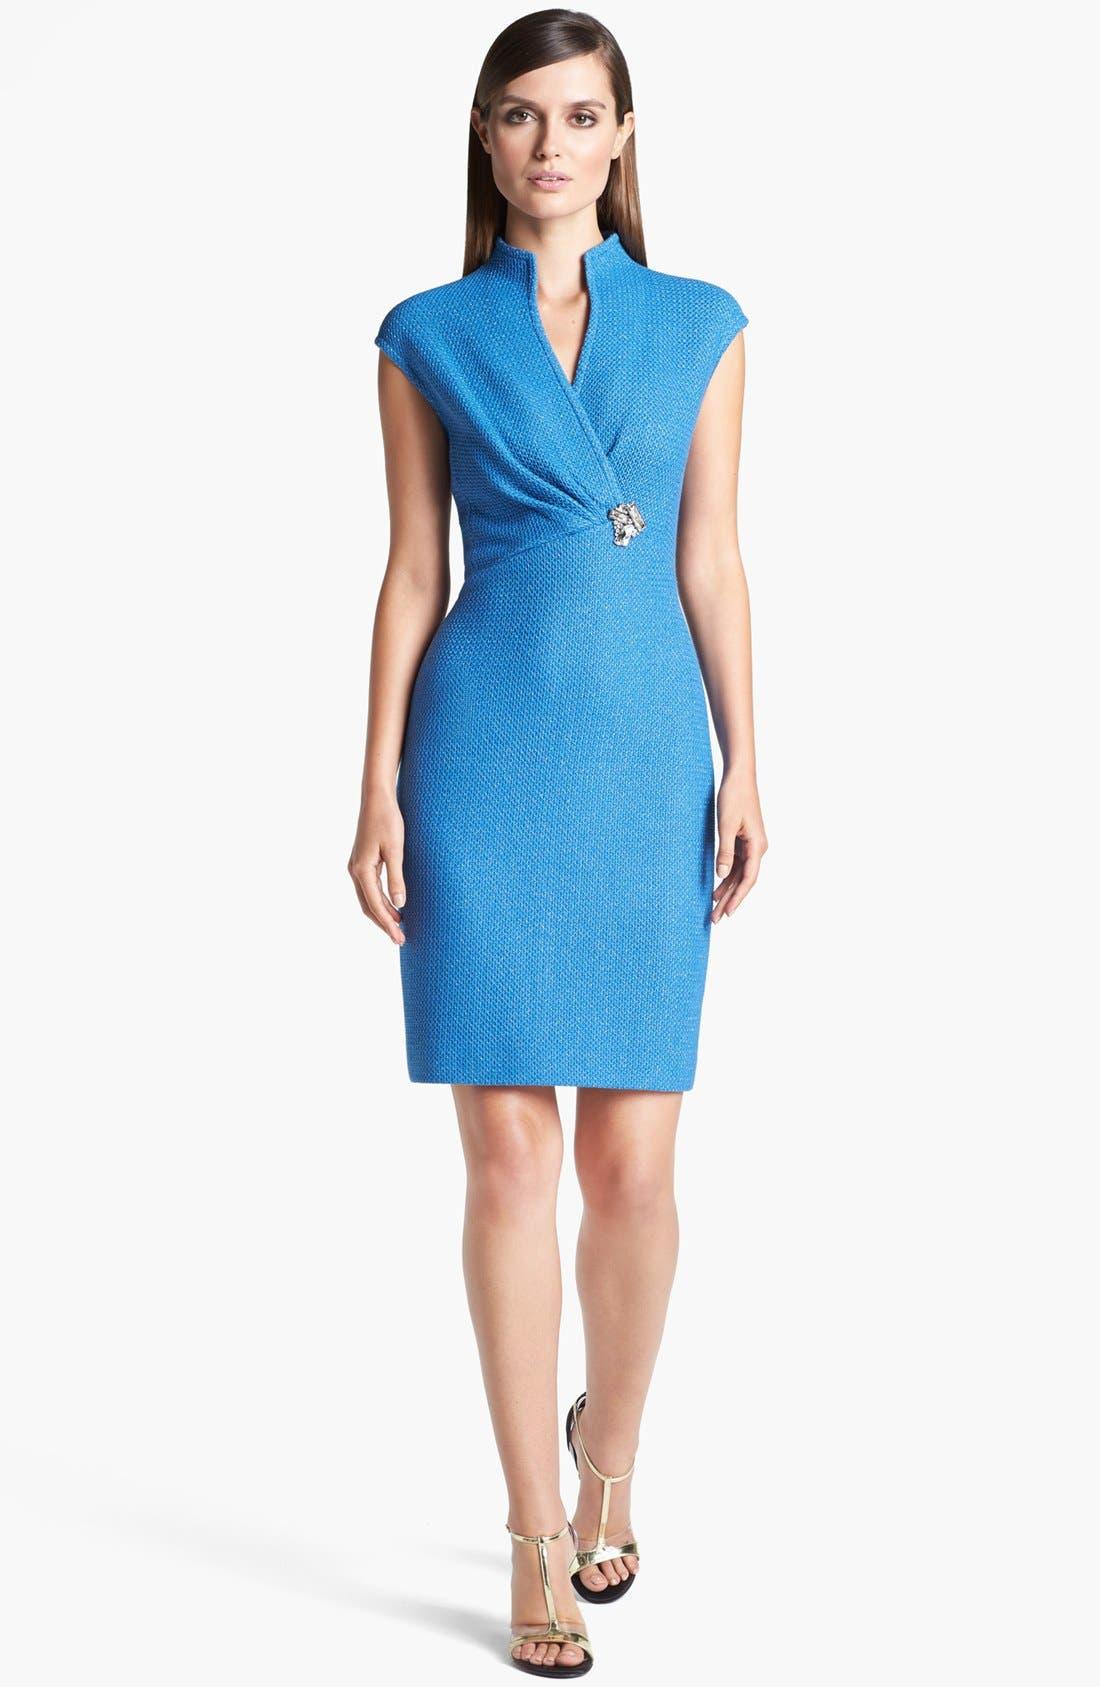 Main Image - St. John Collection Cap Sleeve Metallic Lattice Knit Dress